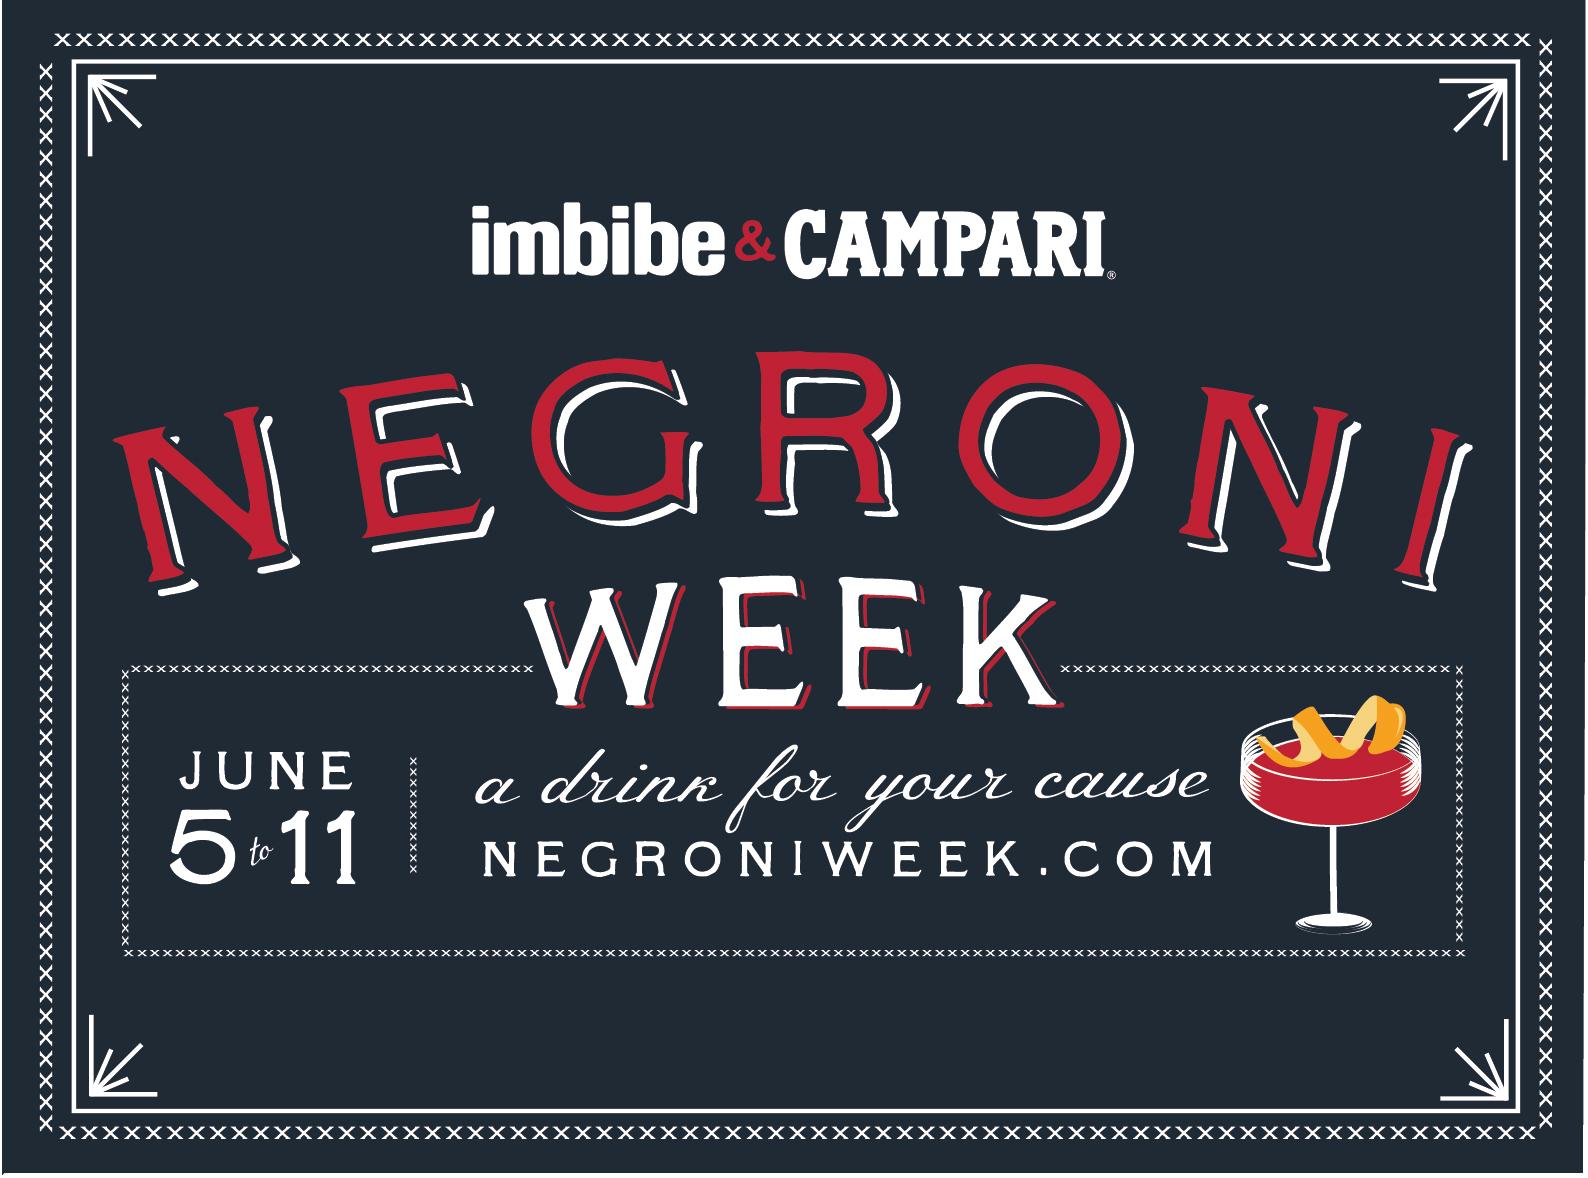 #NegroniWeek: l'iniziativa Campari a scopo benefico